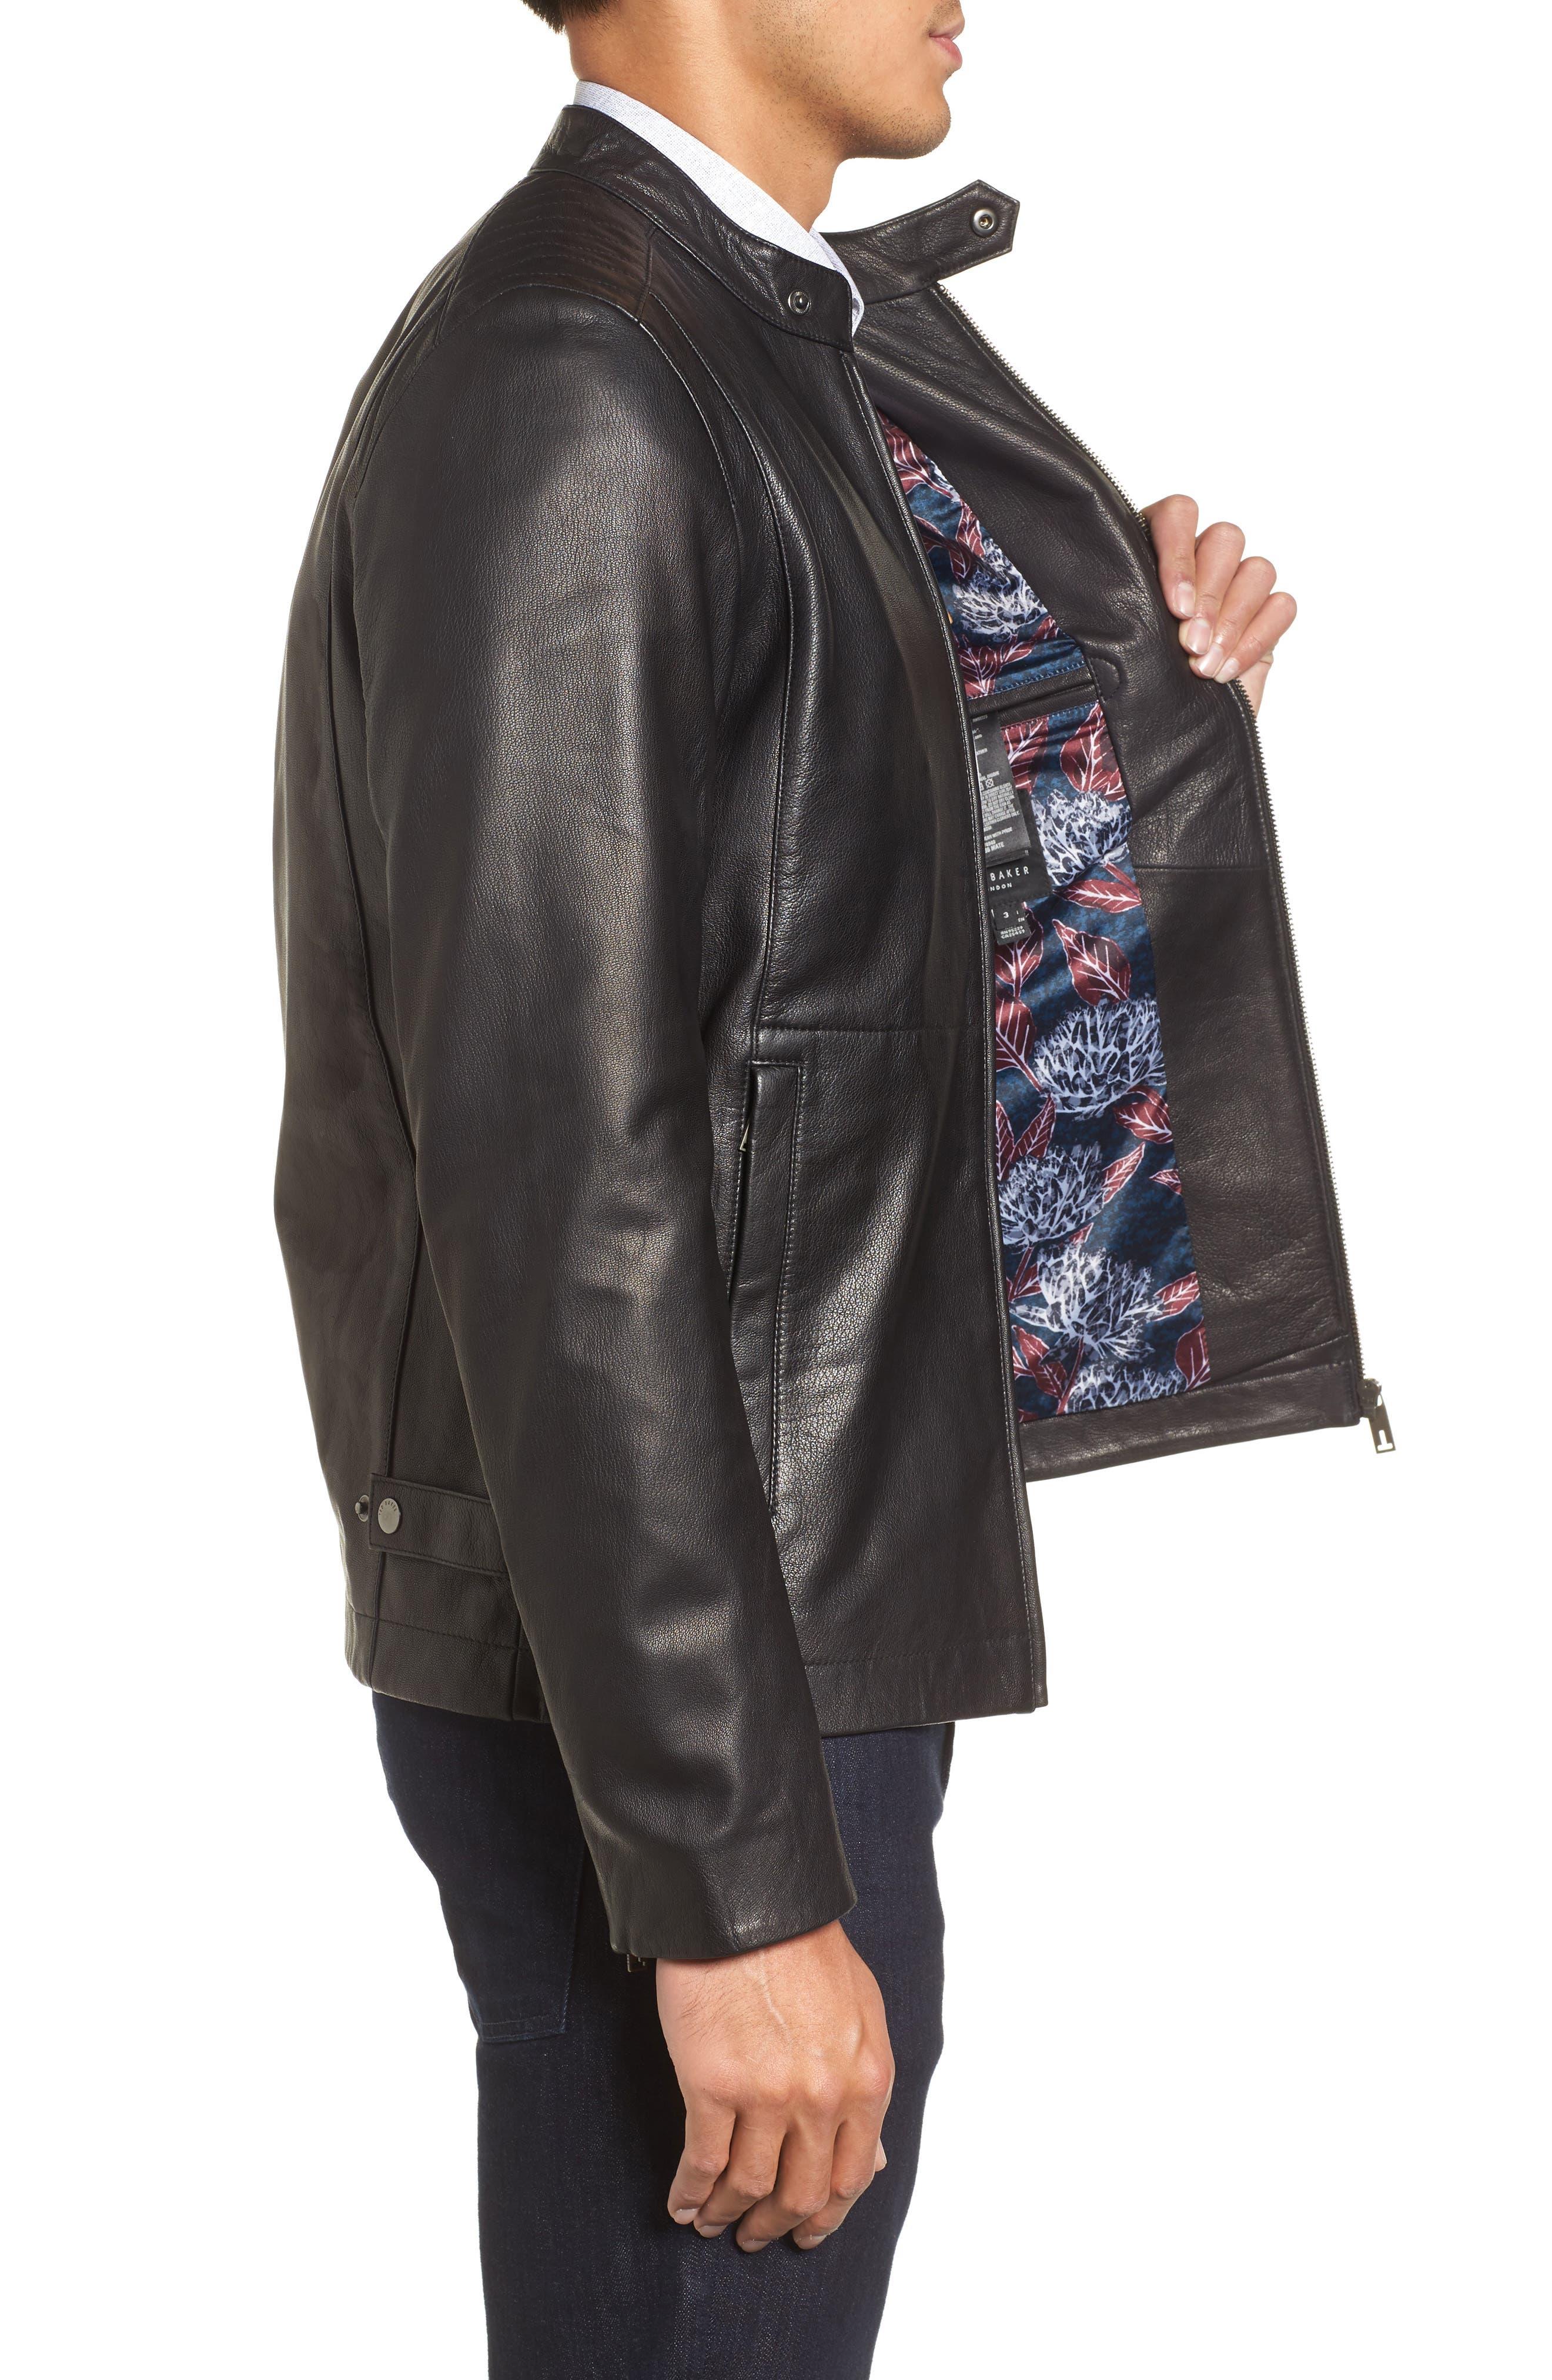 Mate Leather Biker Jacket,                             Alternate thumbnail 3, color,                             001